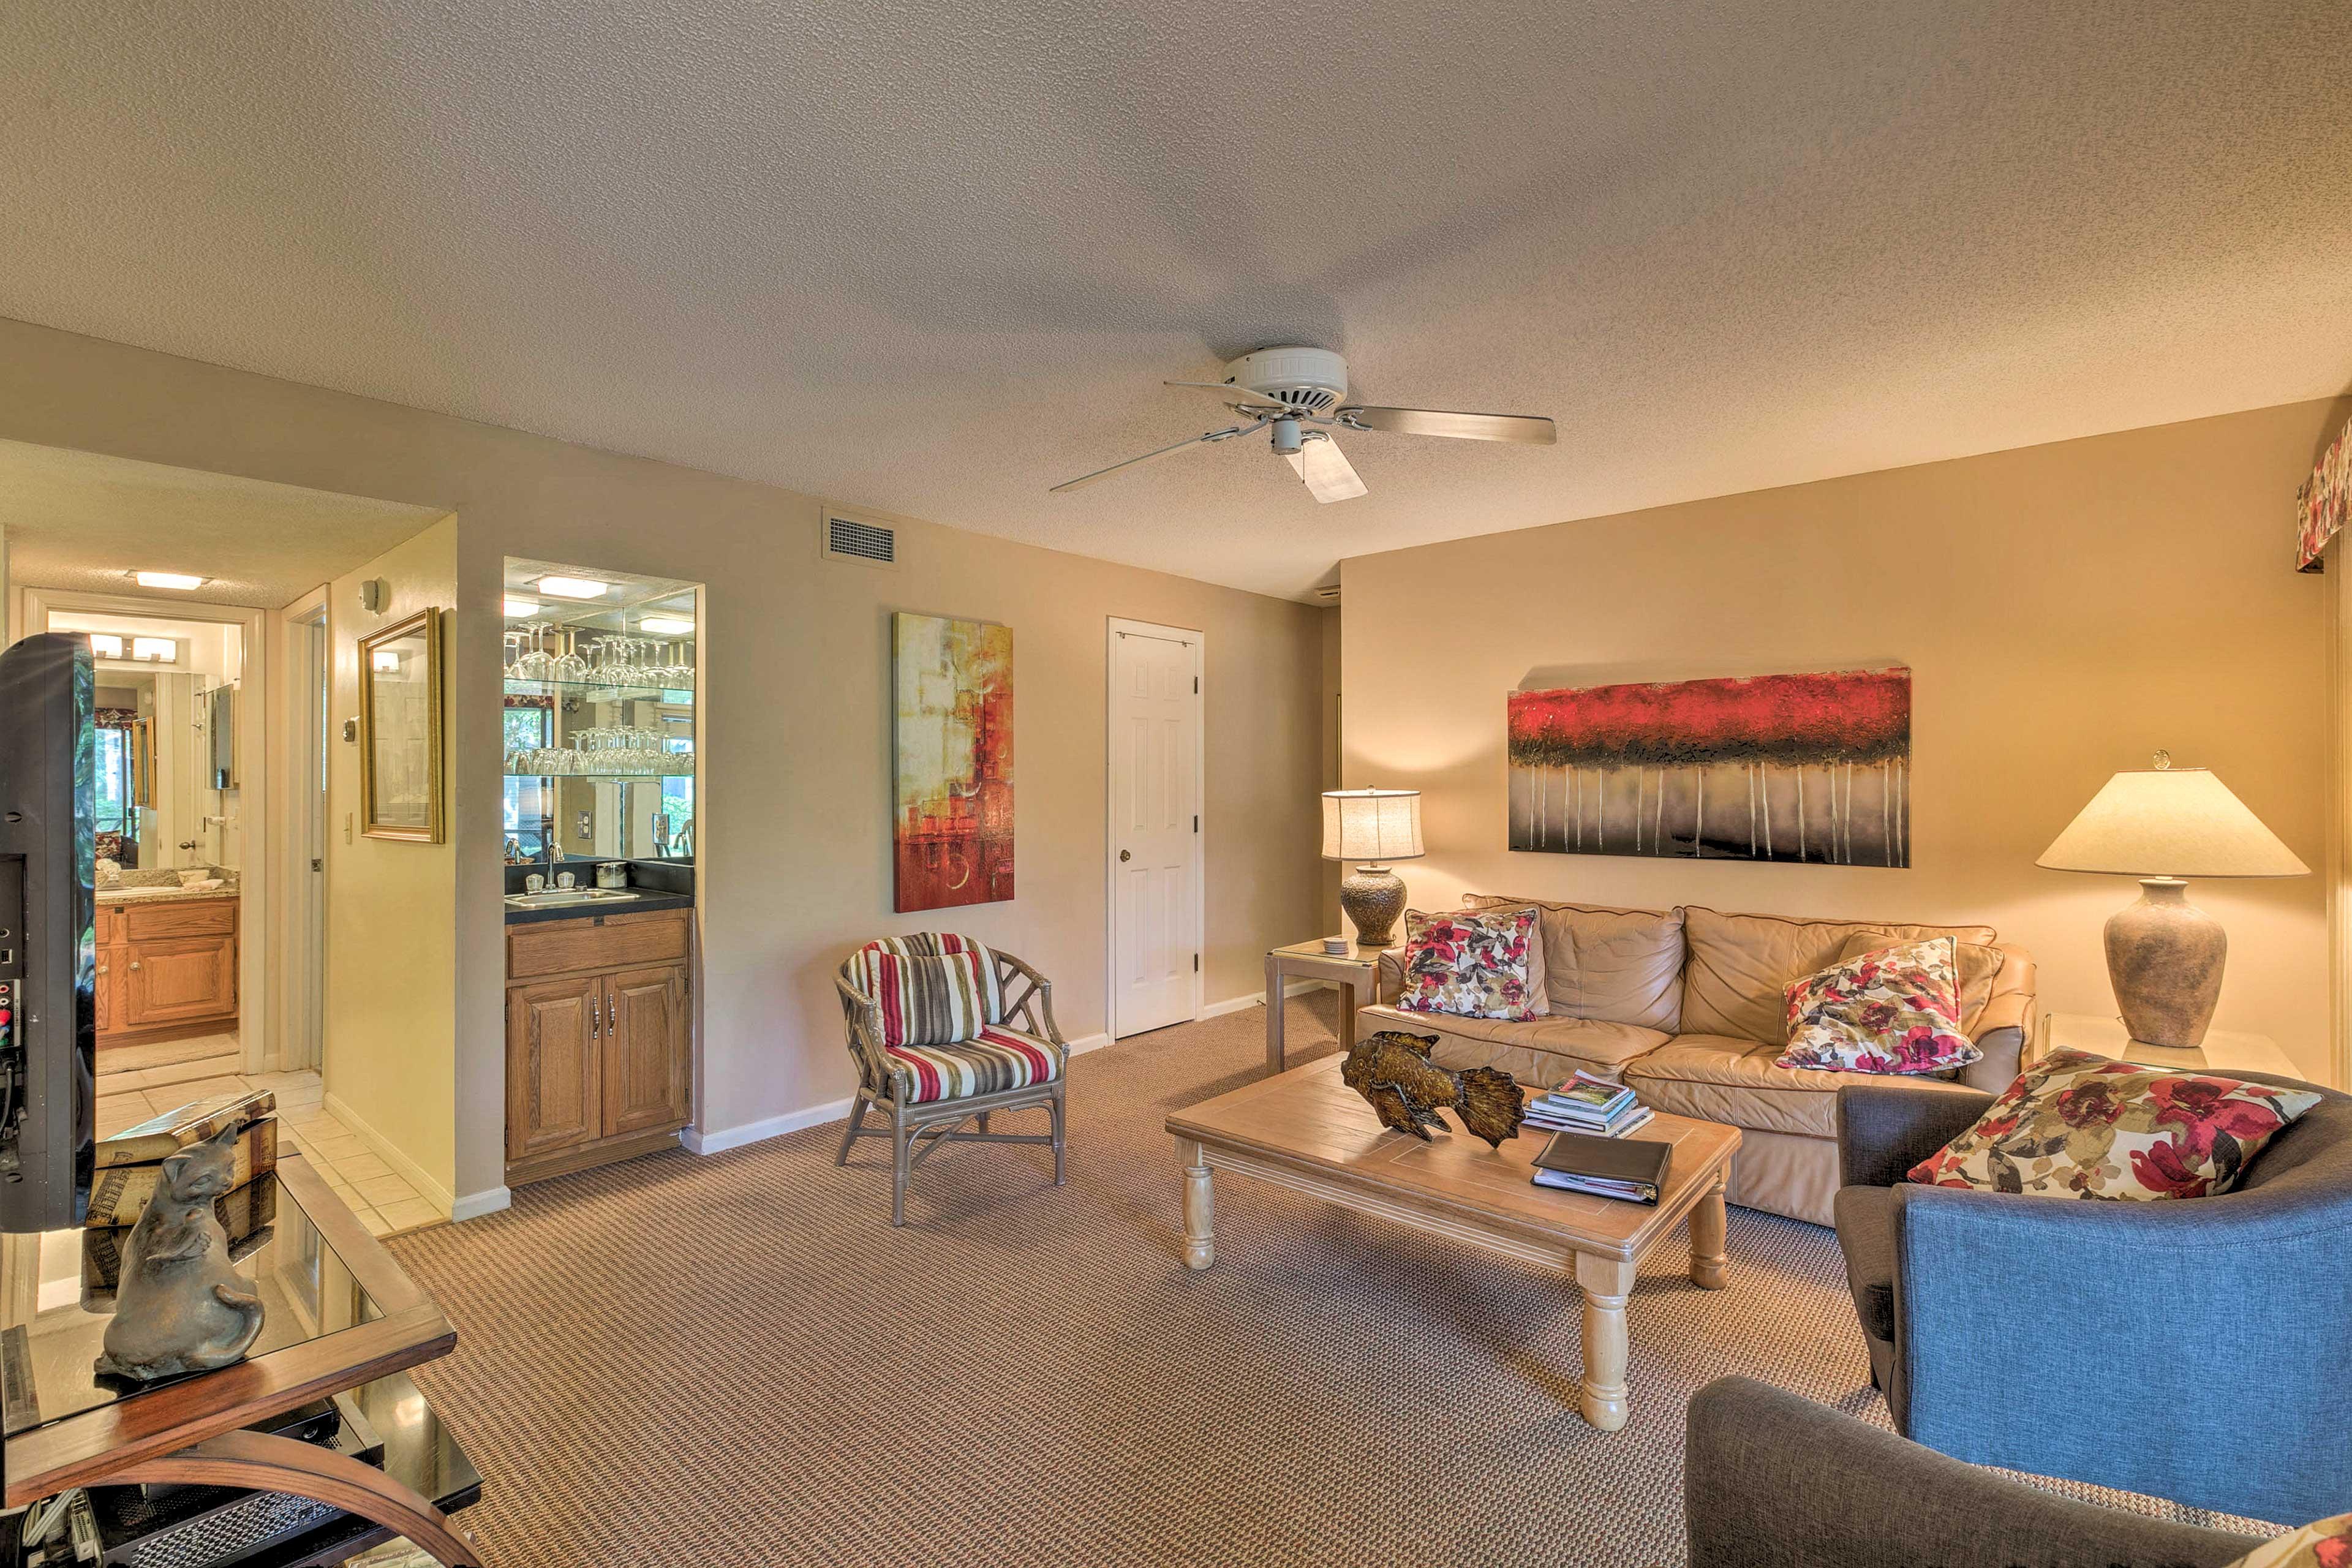 This Kiawah Island home is both elegant and comfortable.